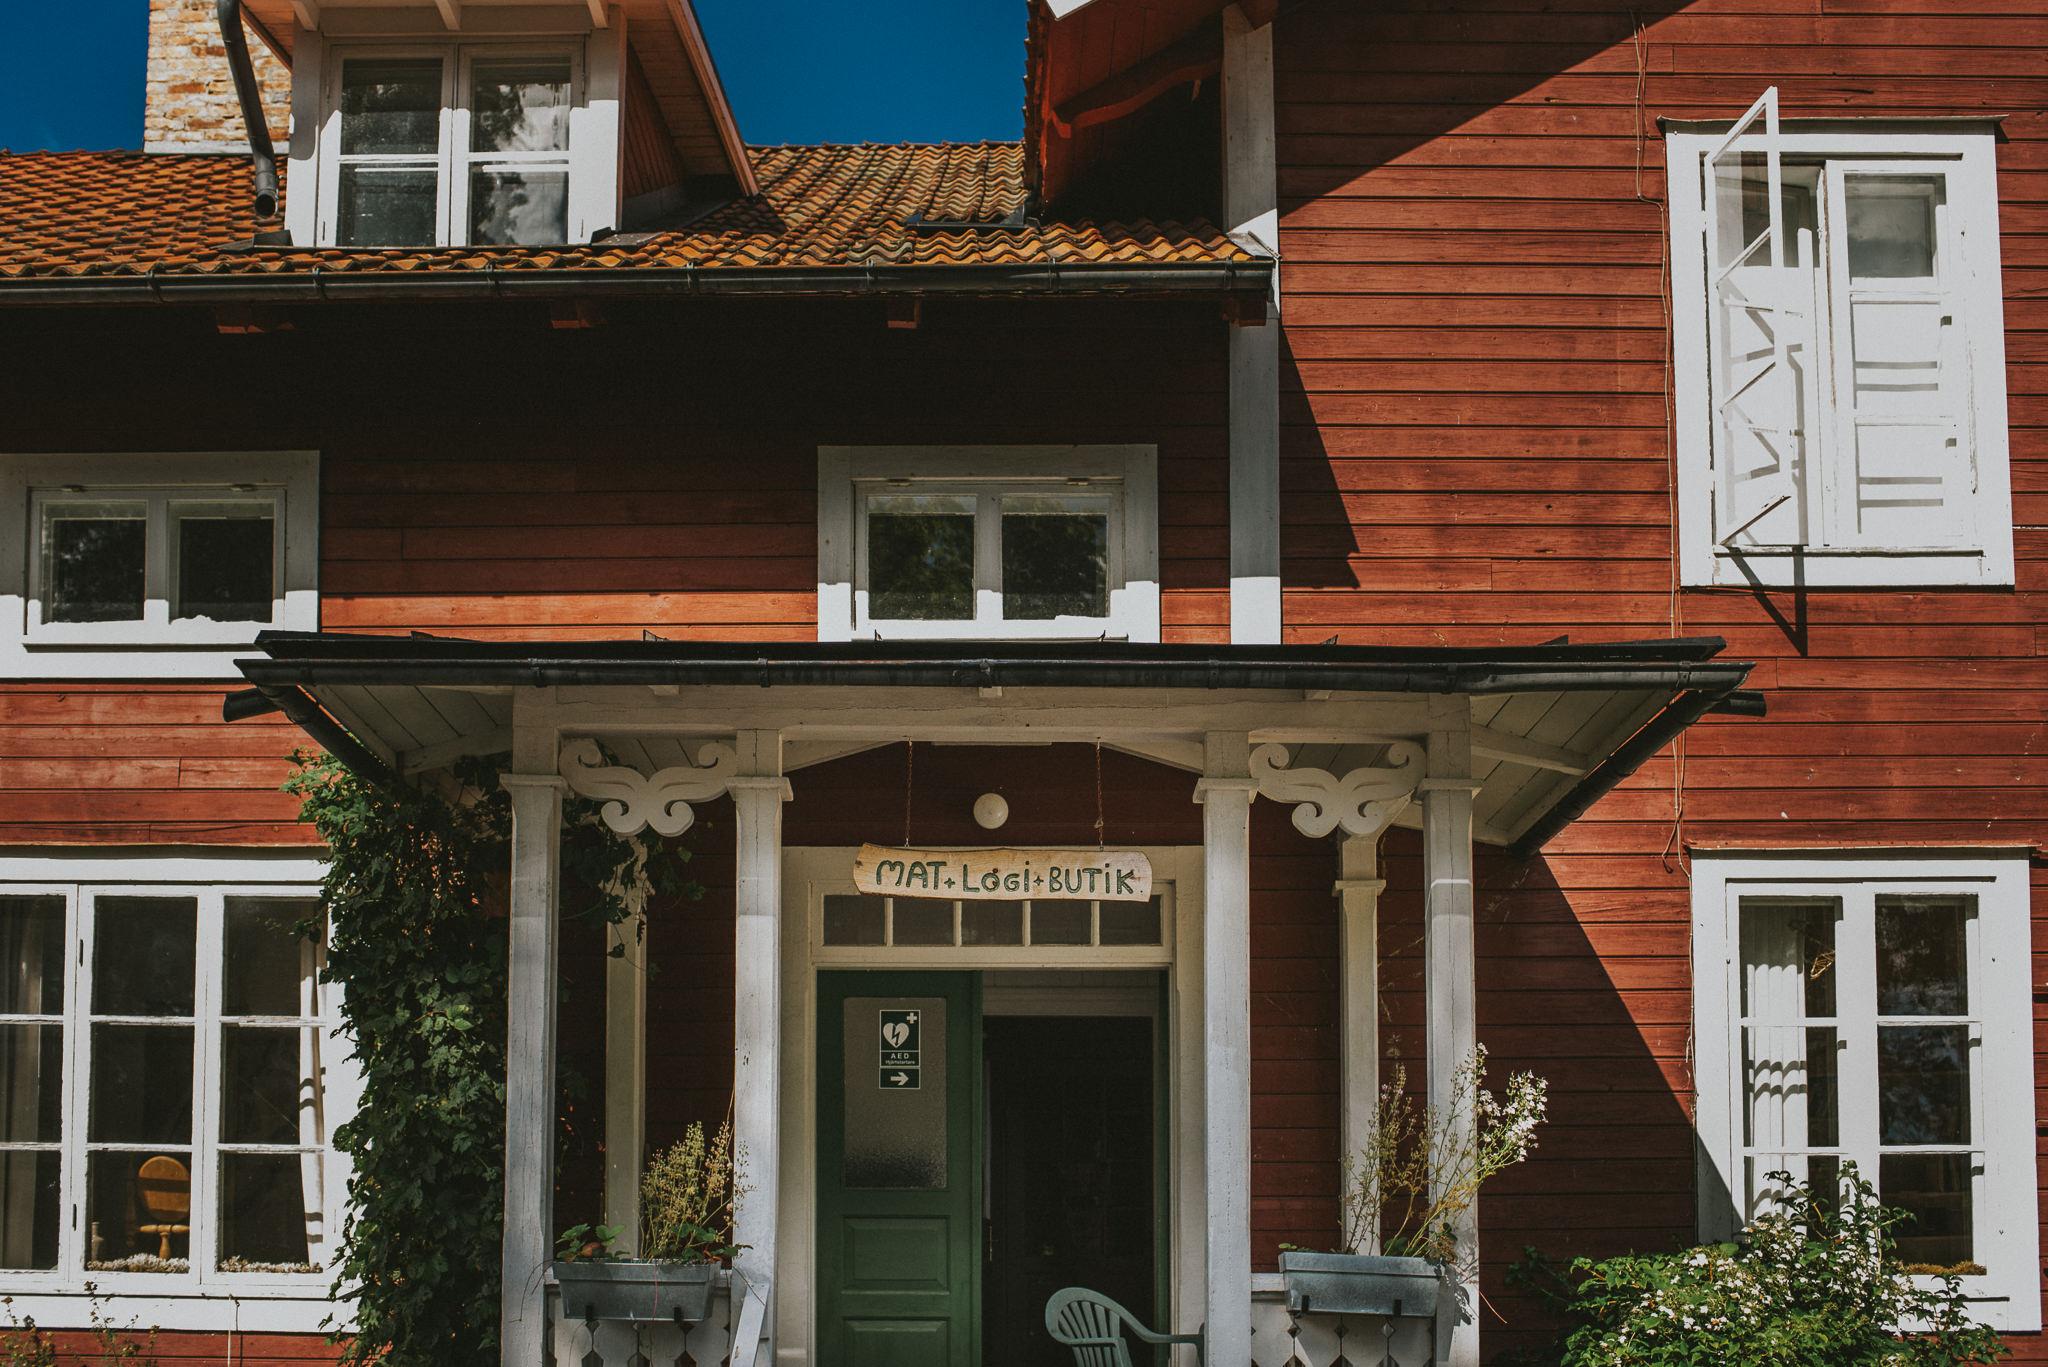 sweden-wedding-martarobin-3940.jpg